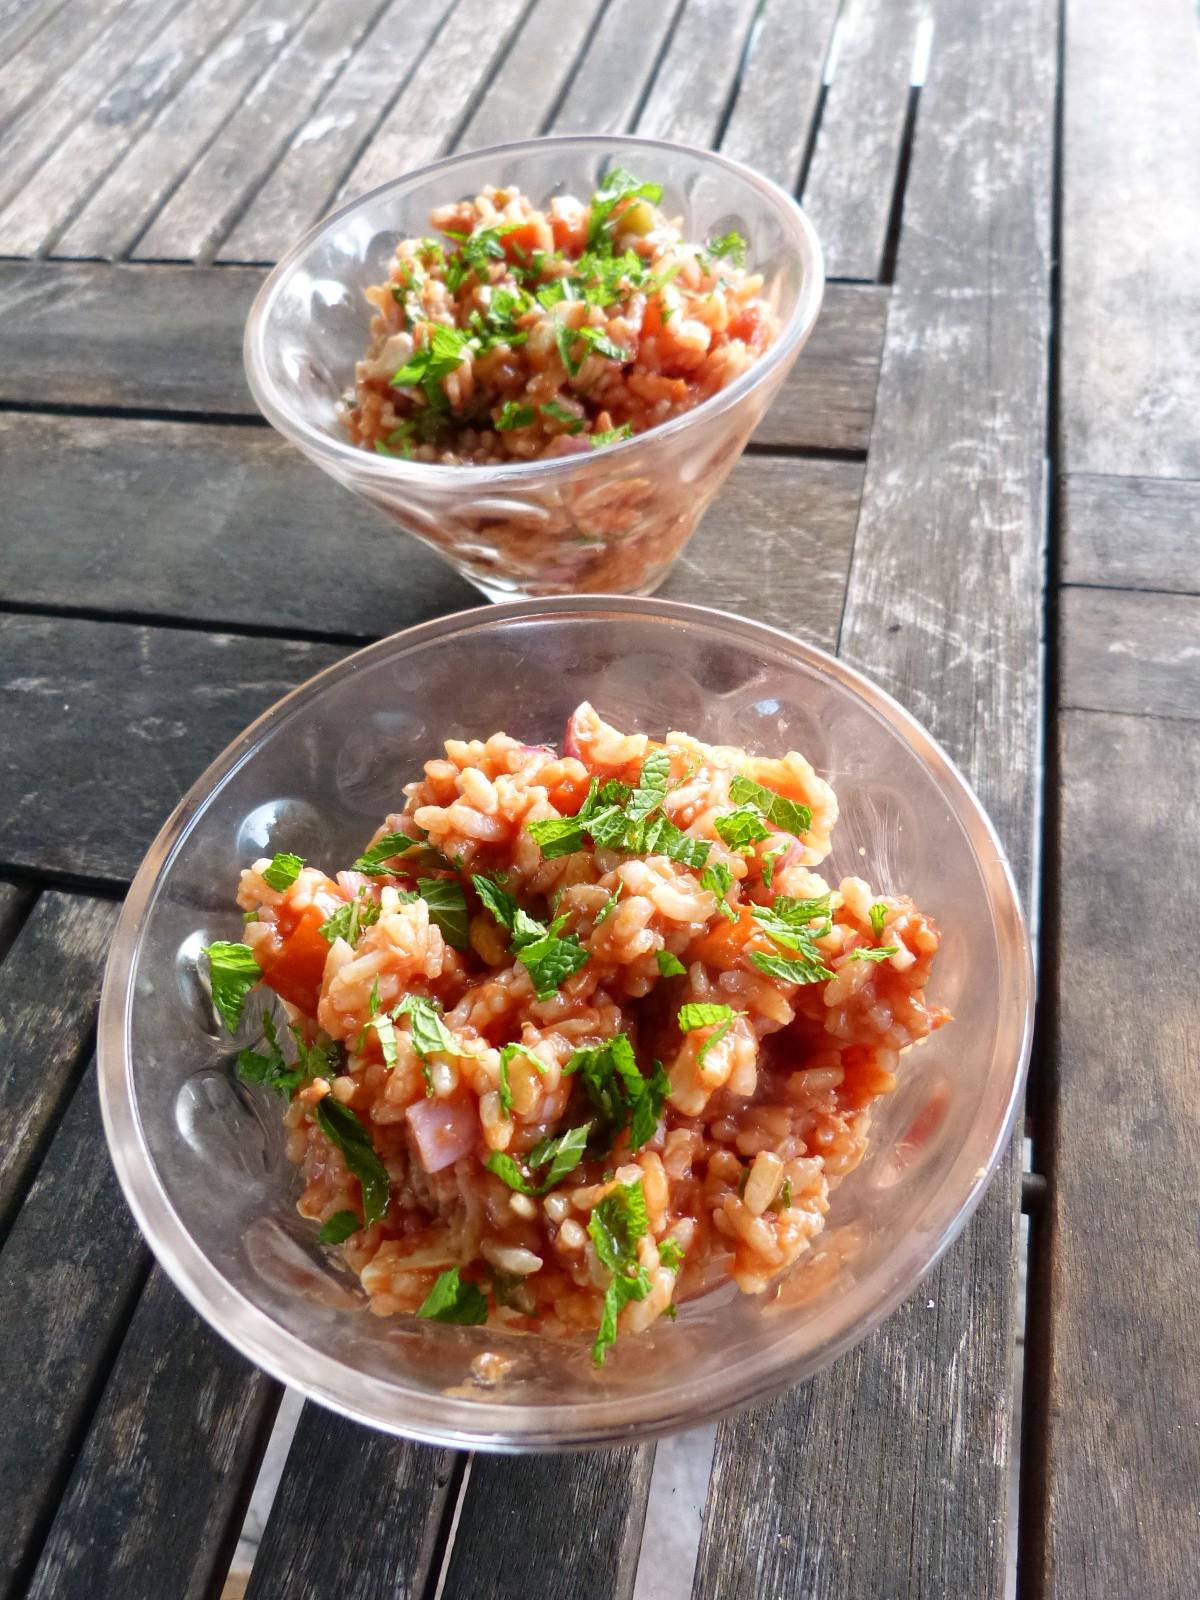 Salade de riz à la méditerranéenne